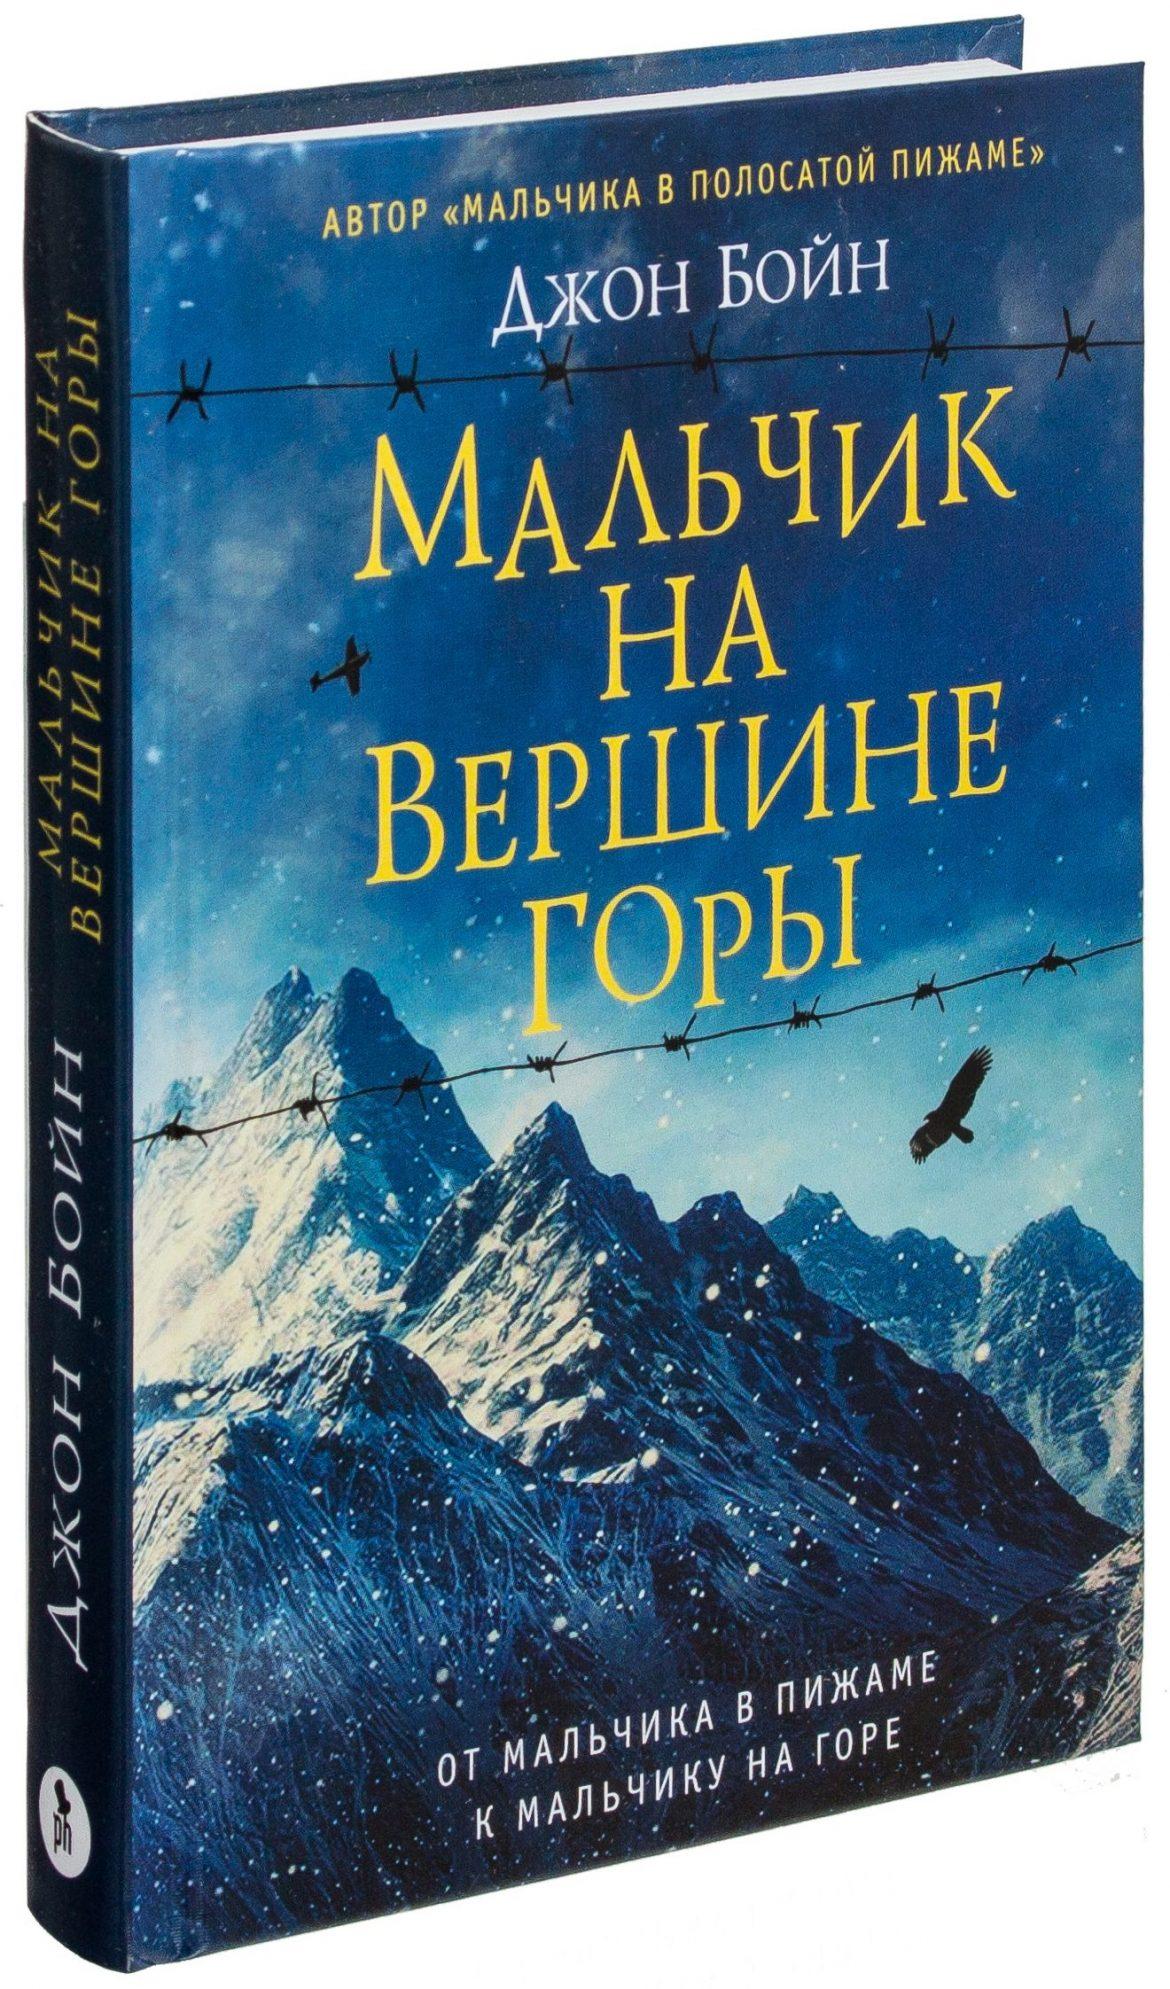 Мальчик на вершине горы — Джон Бойн